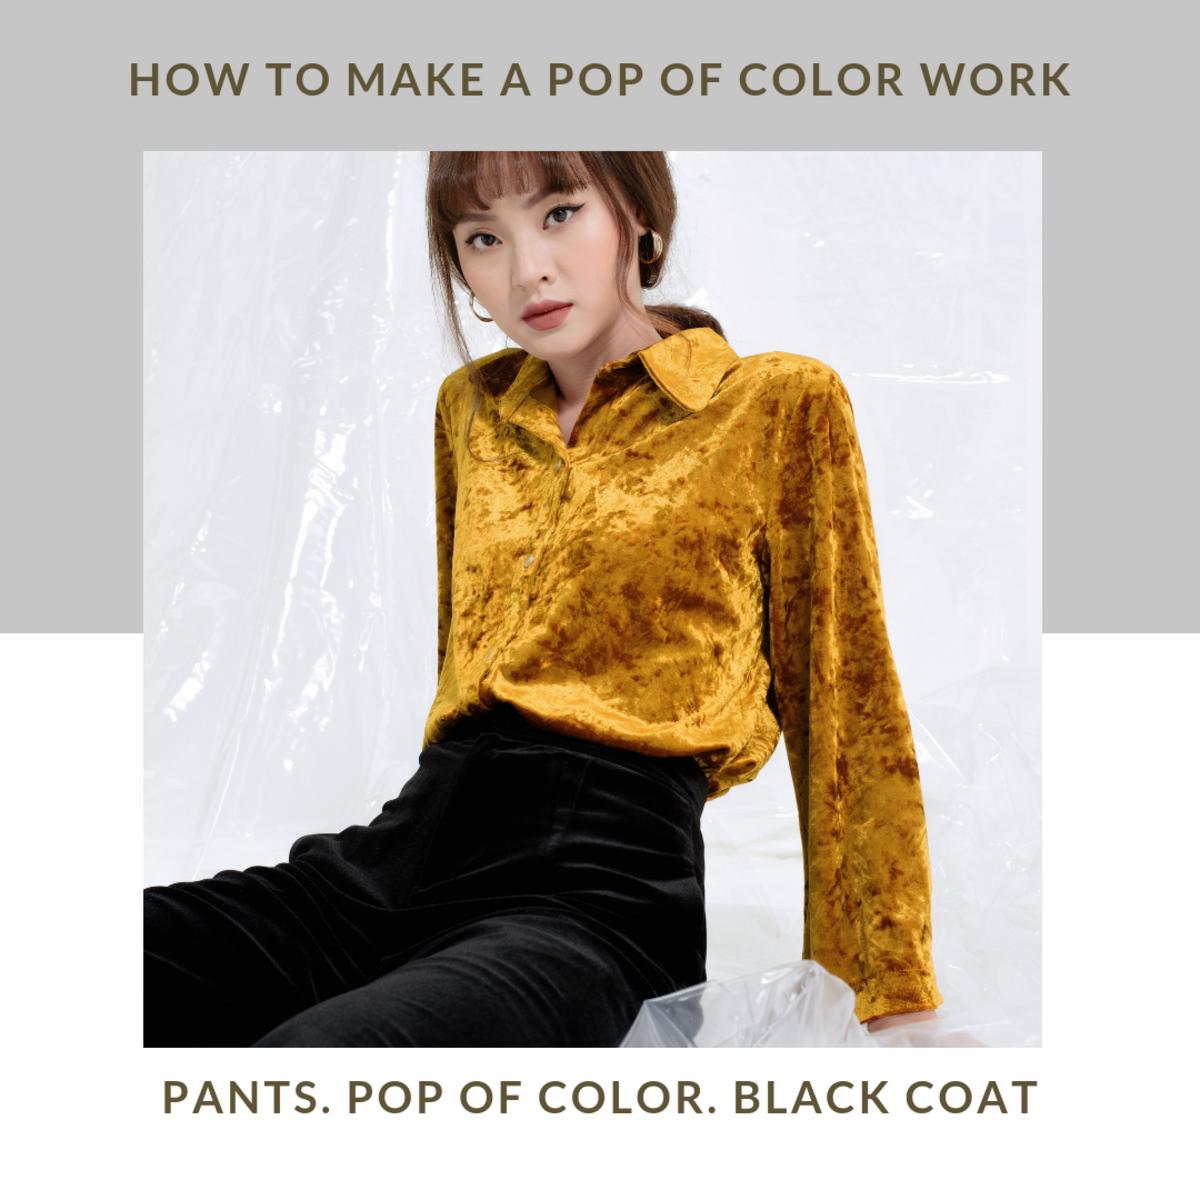 Color is ok so long as it's used tastefully.